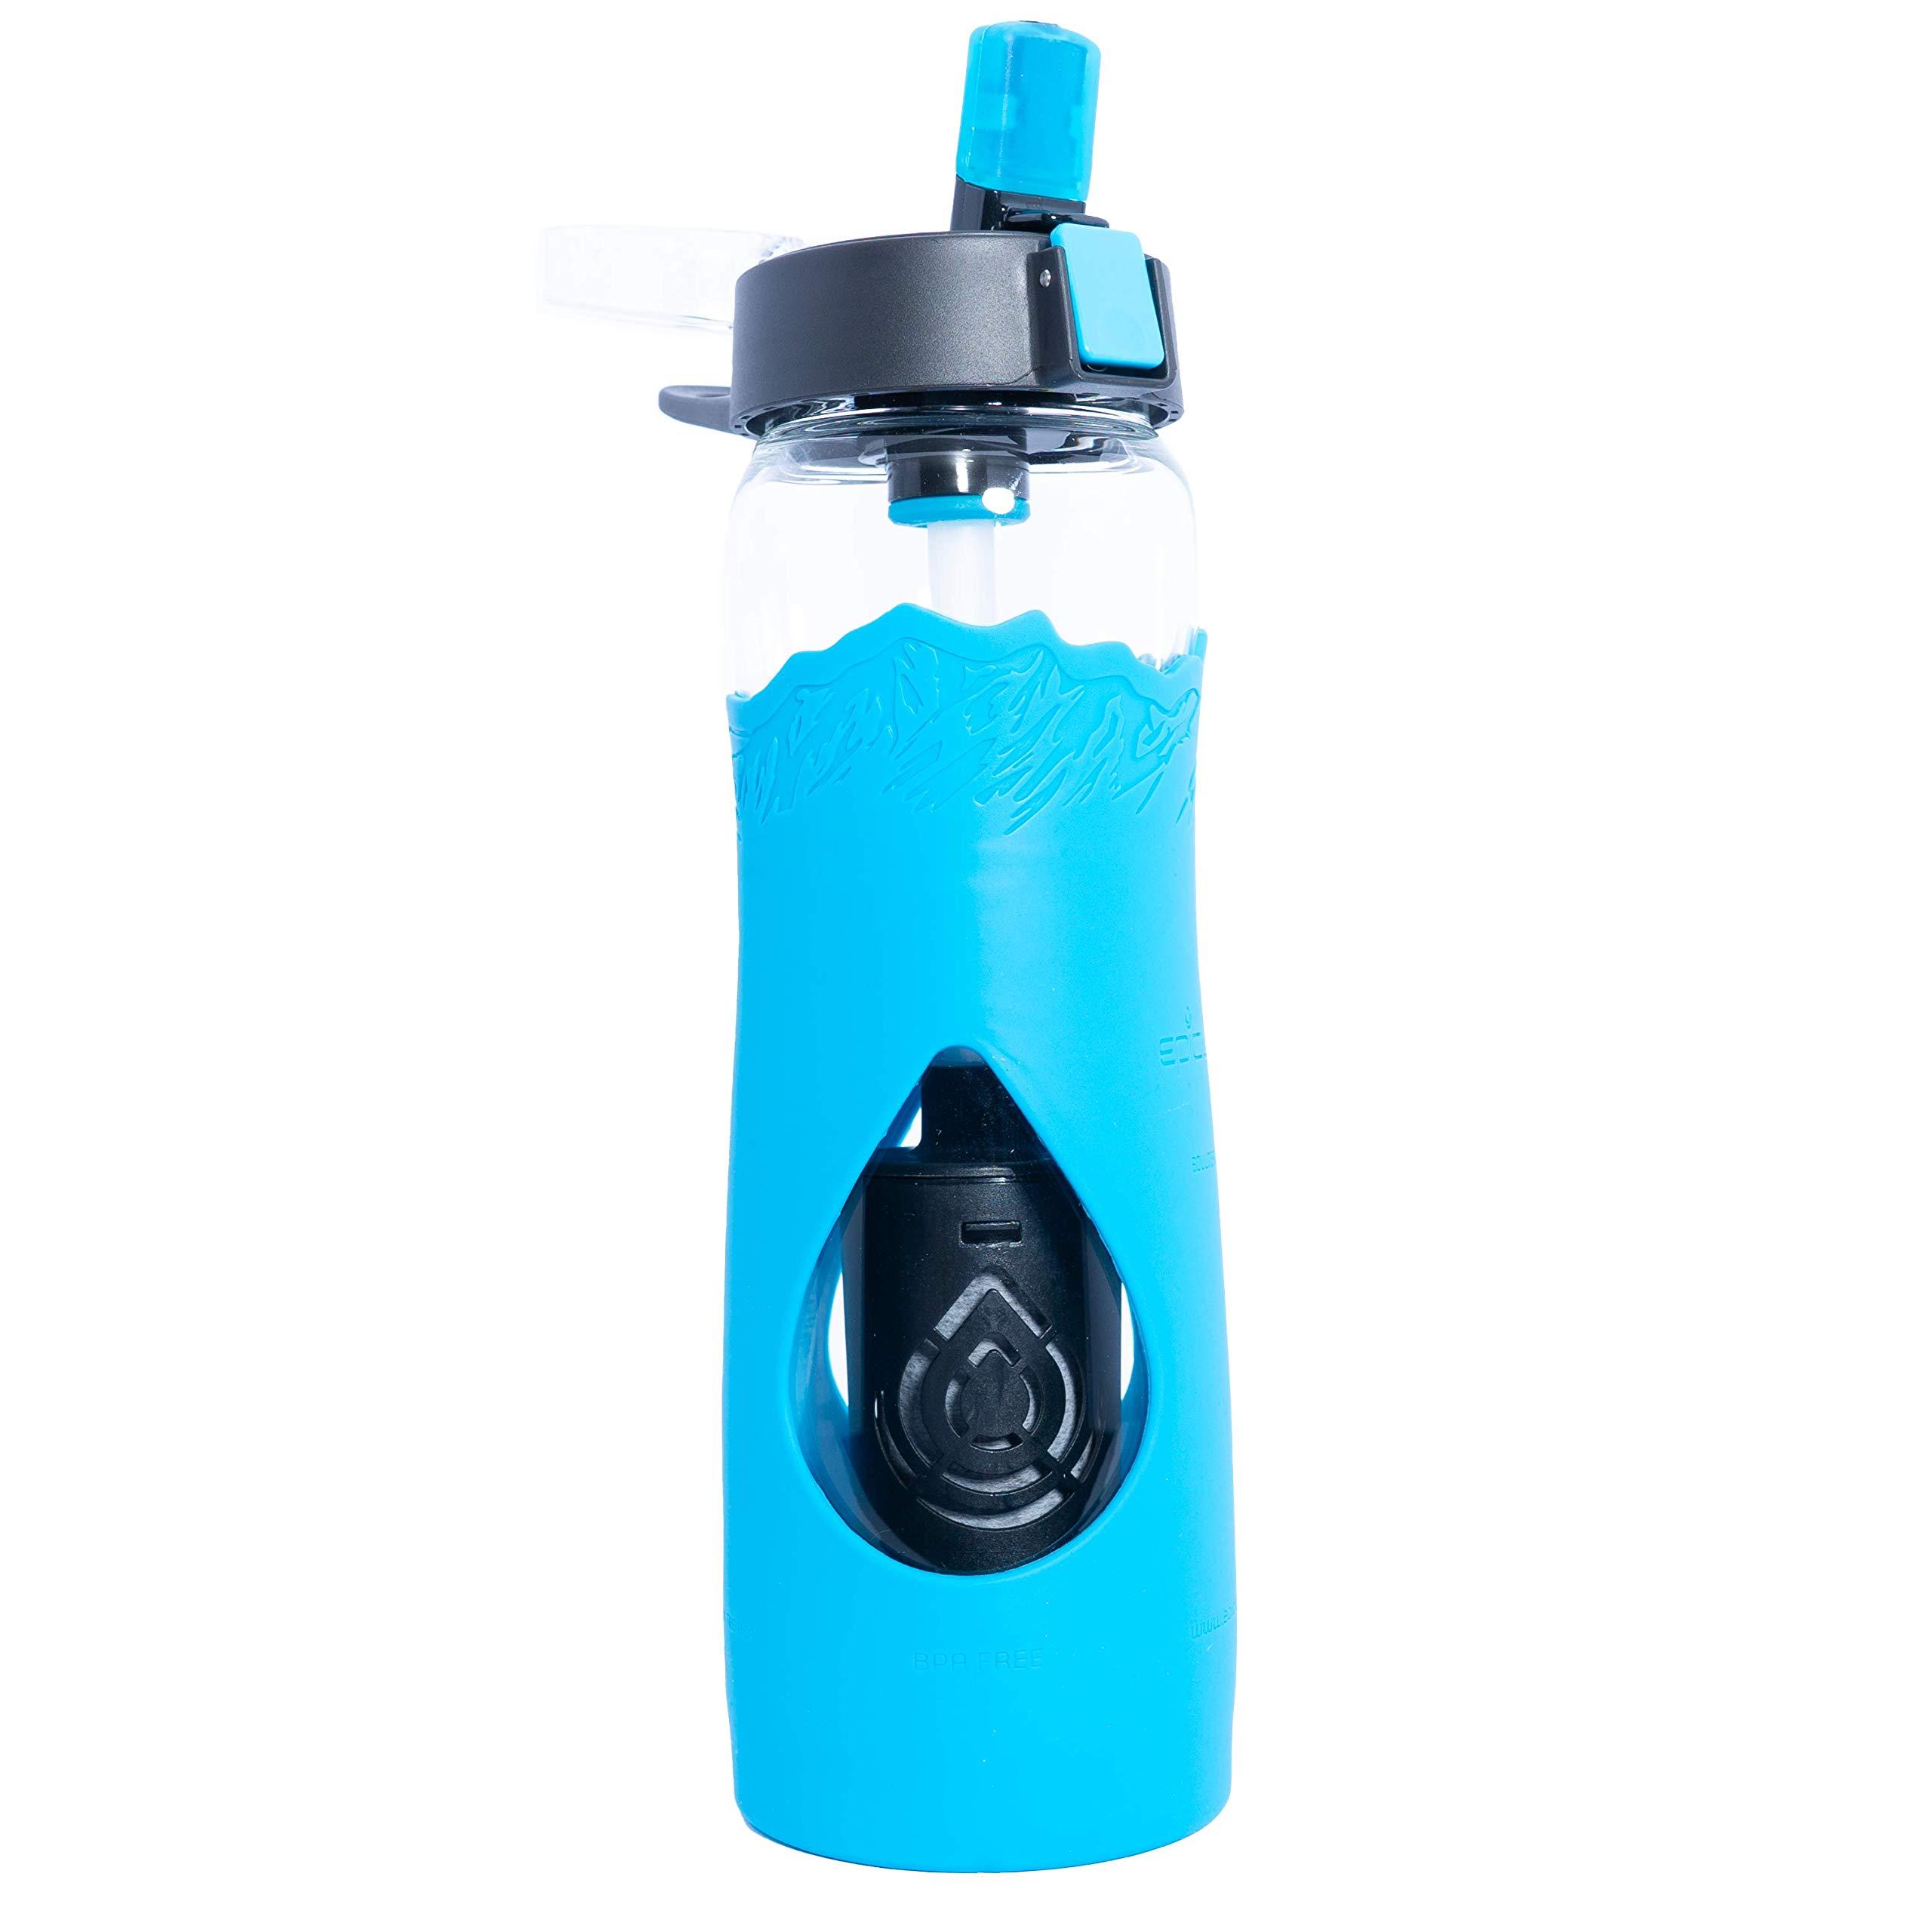 giardia water bottle meddig, mióta a tabletták férgek kijönnek